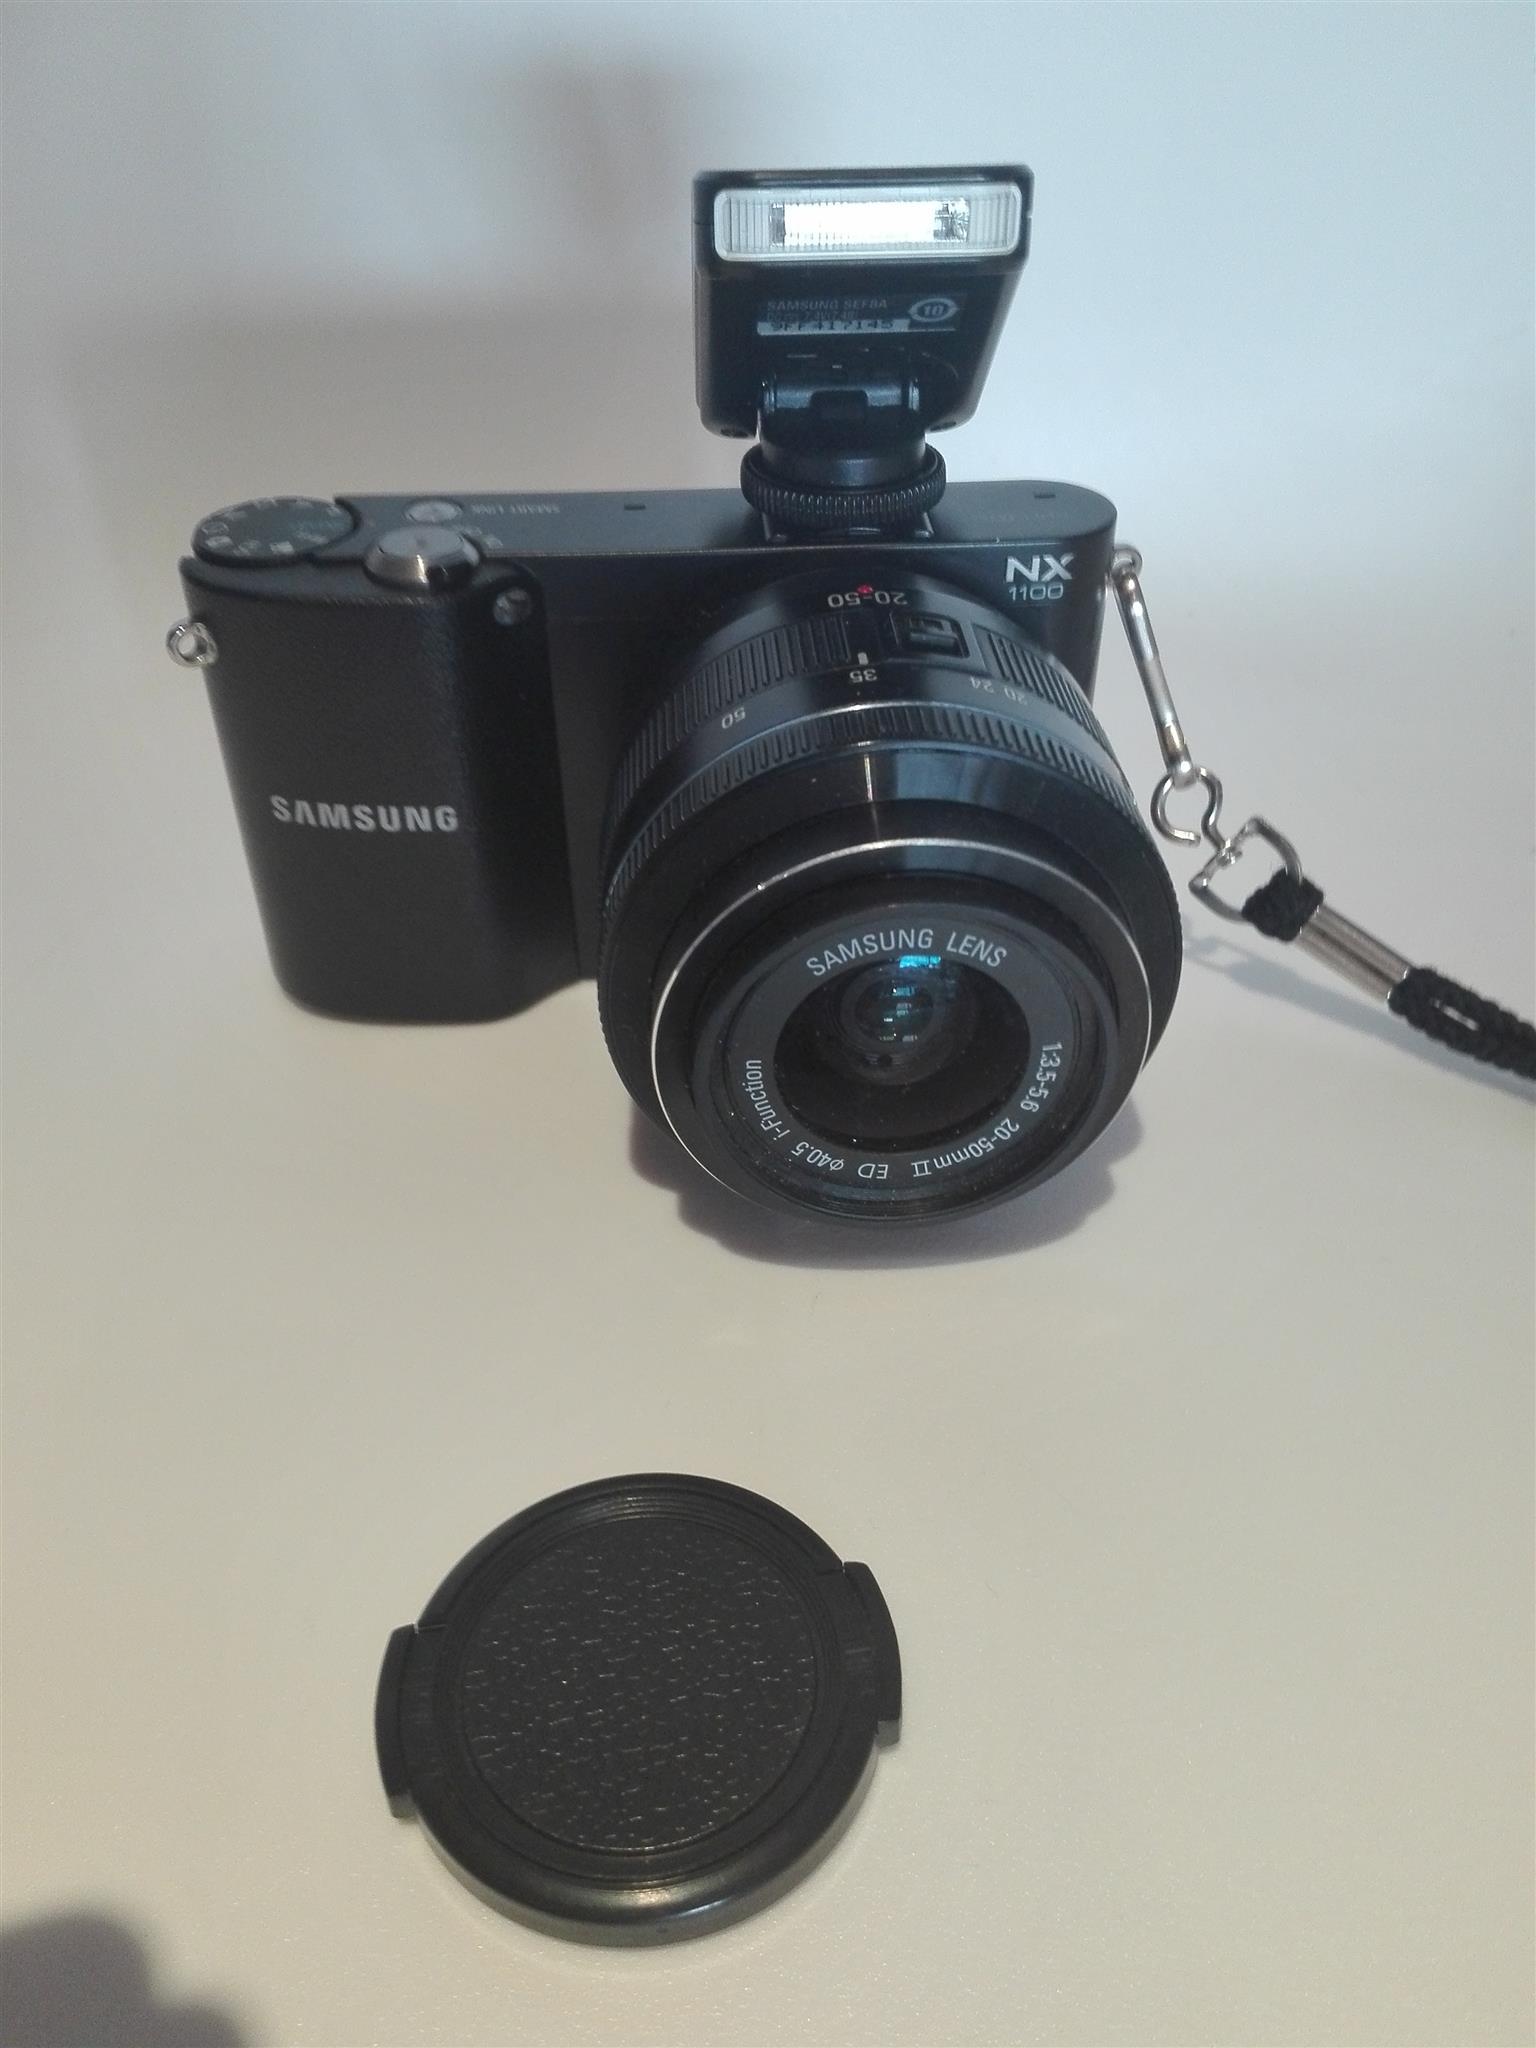 Samsung Digital NX1100 Camera